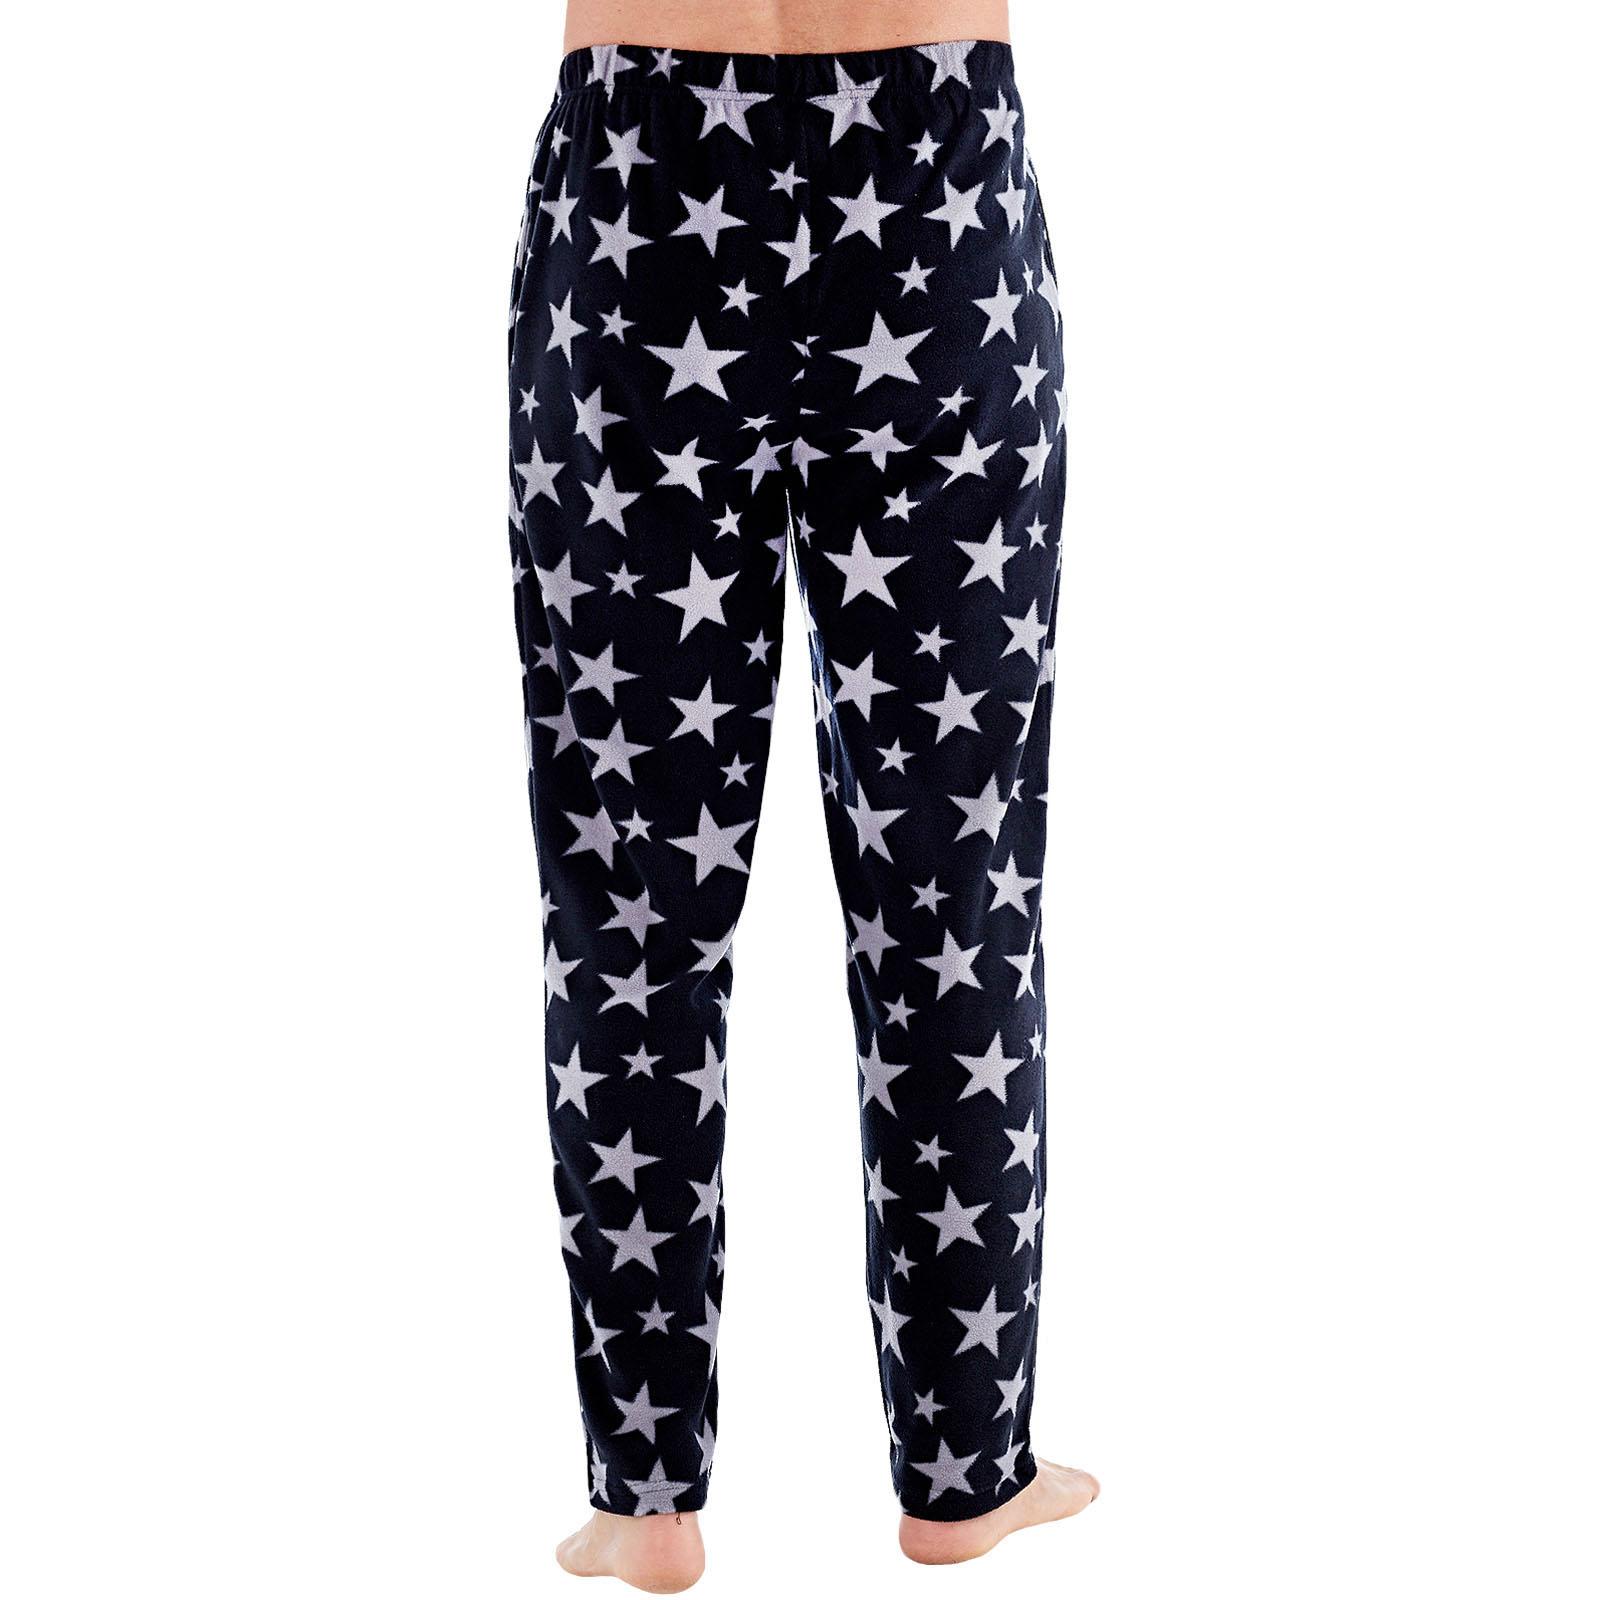 Harvey-James-Mens-Star-Fleece-Pyjama-Bottoms-Loungewear-Pants-Trousers Indexbild 3